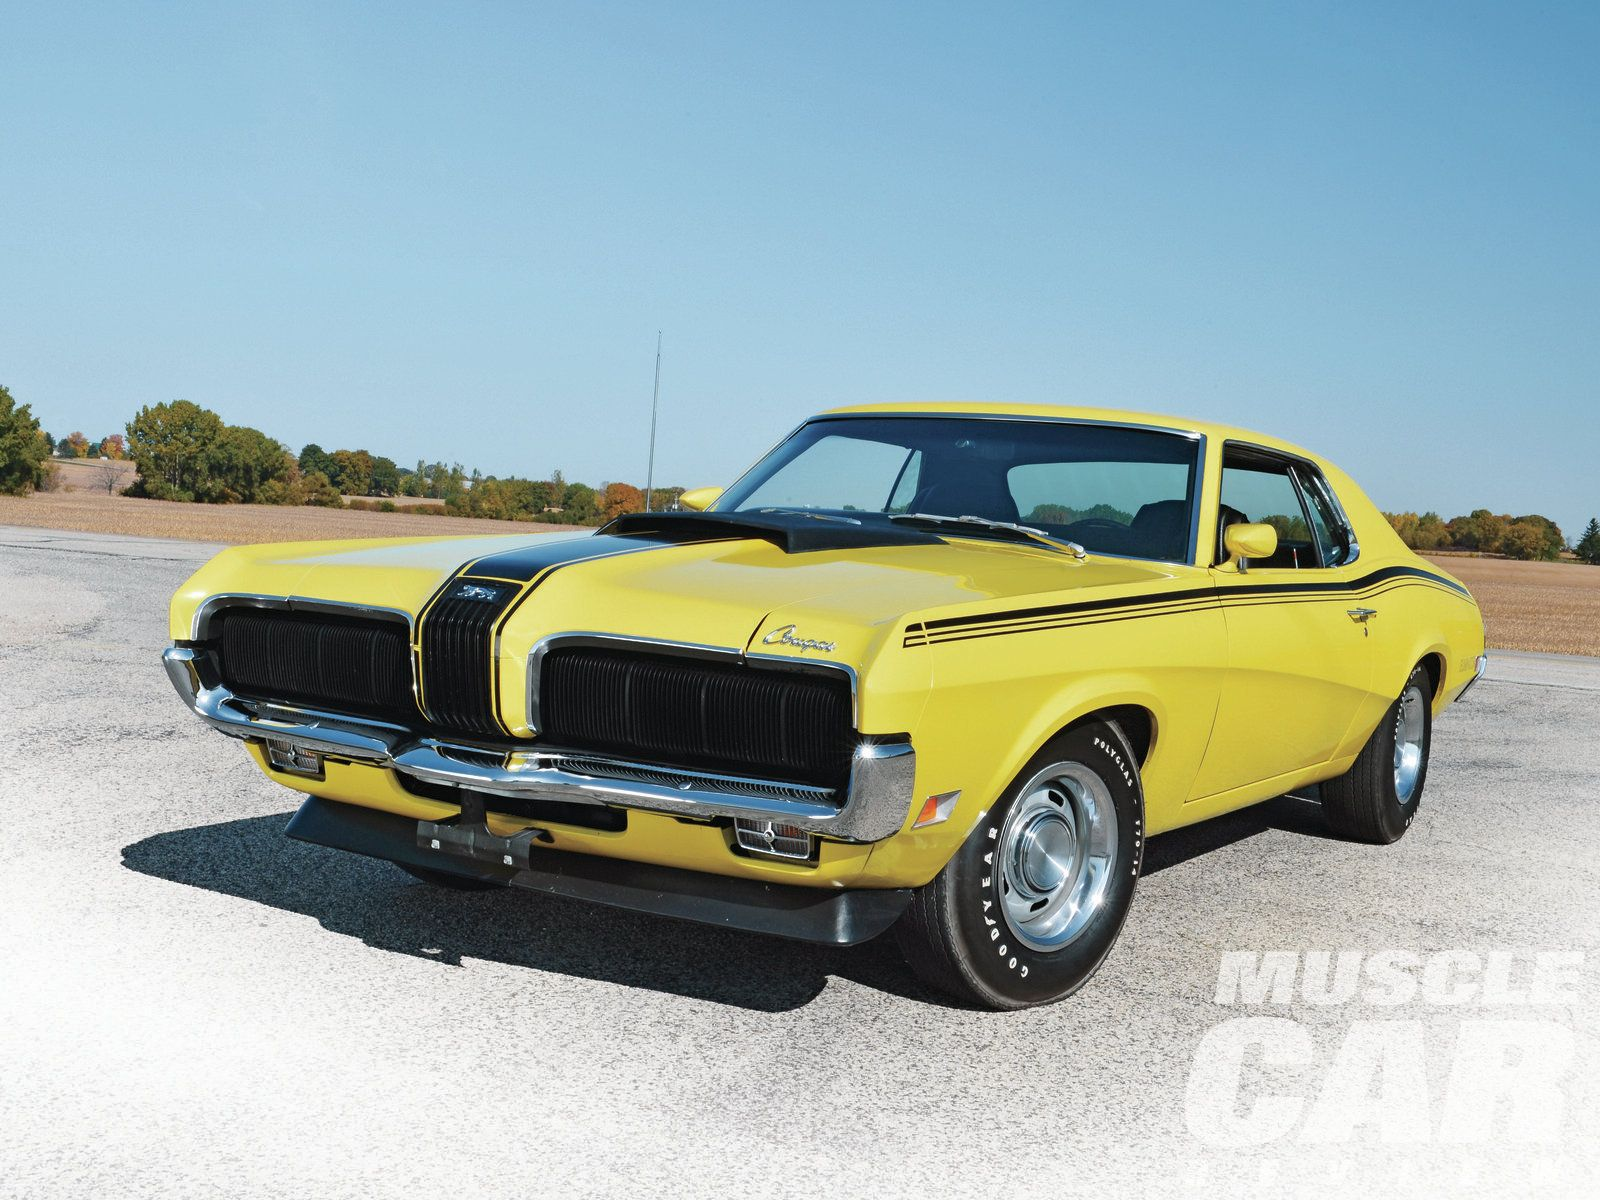 1970-mercury-cougar-front.jpg (1600×1200) | MY FAVORITE NOSES ...